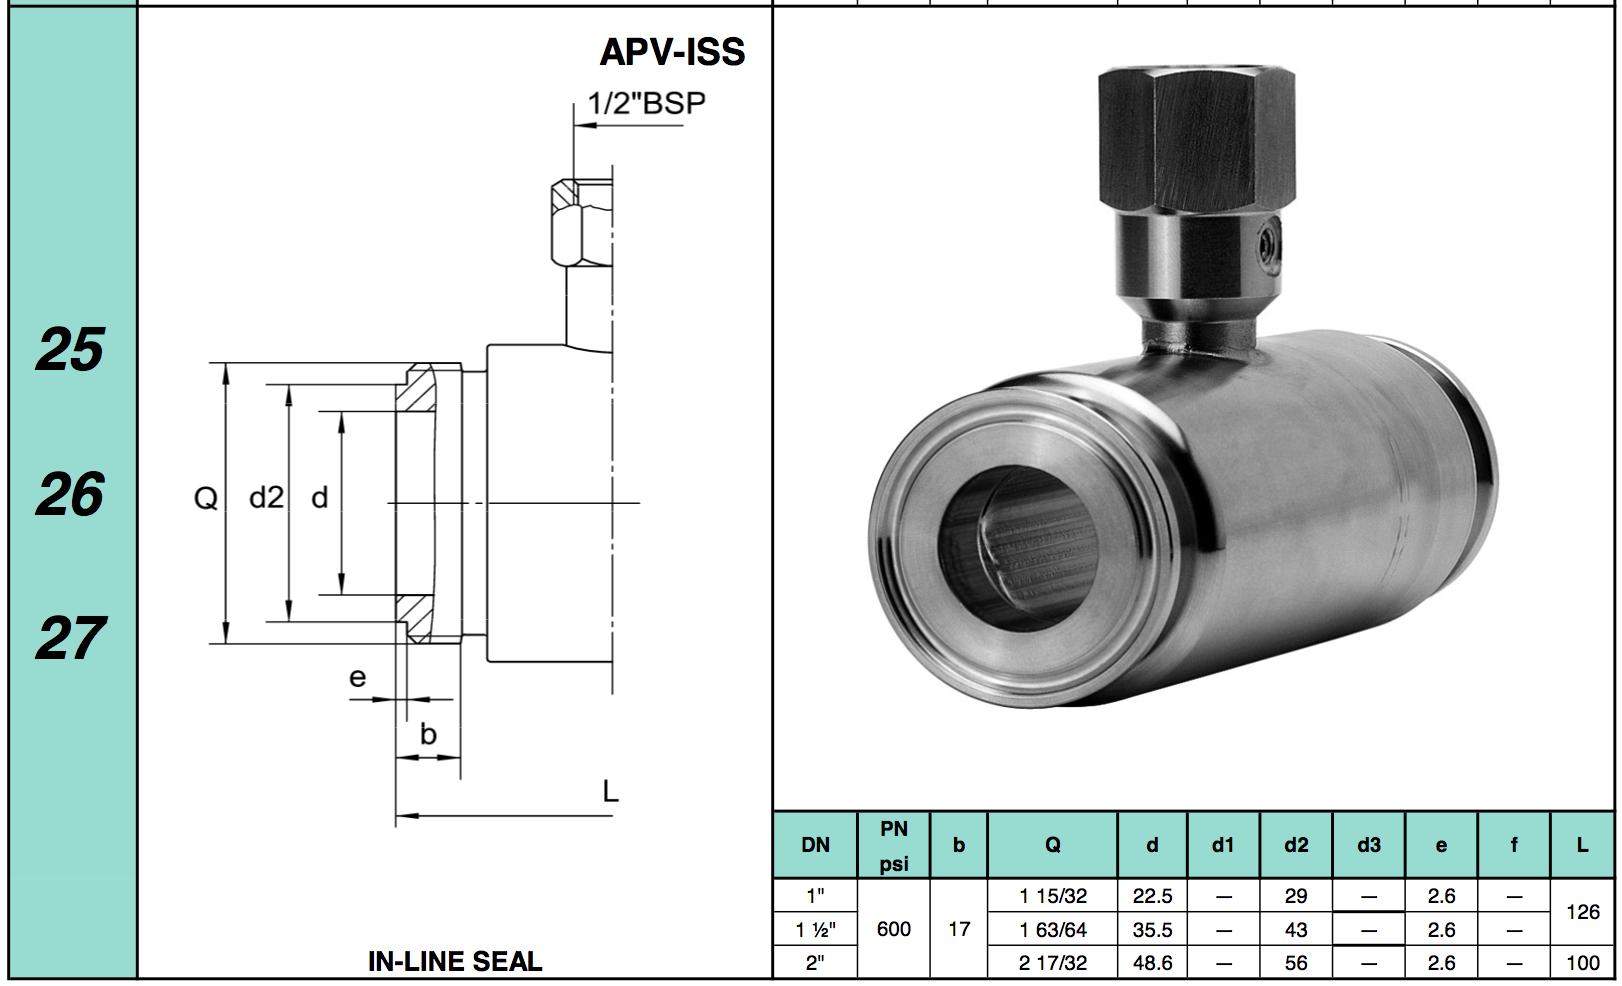 chuẩn kết nối dạng sanitary seal APV - ISS